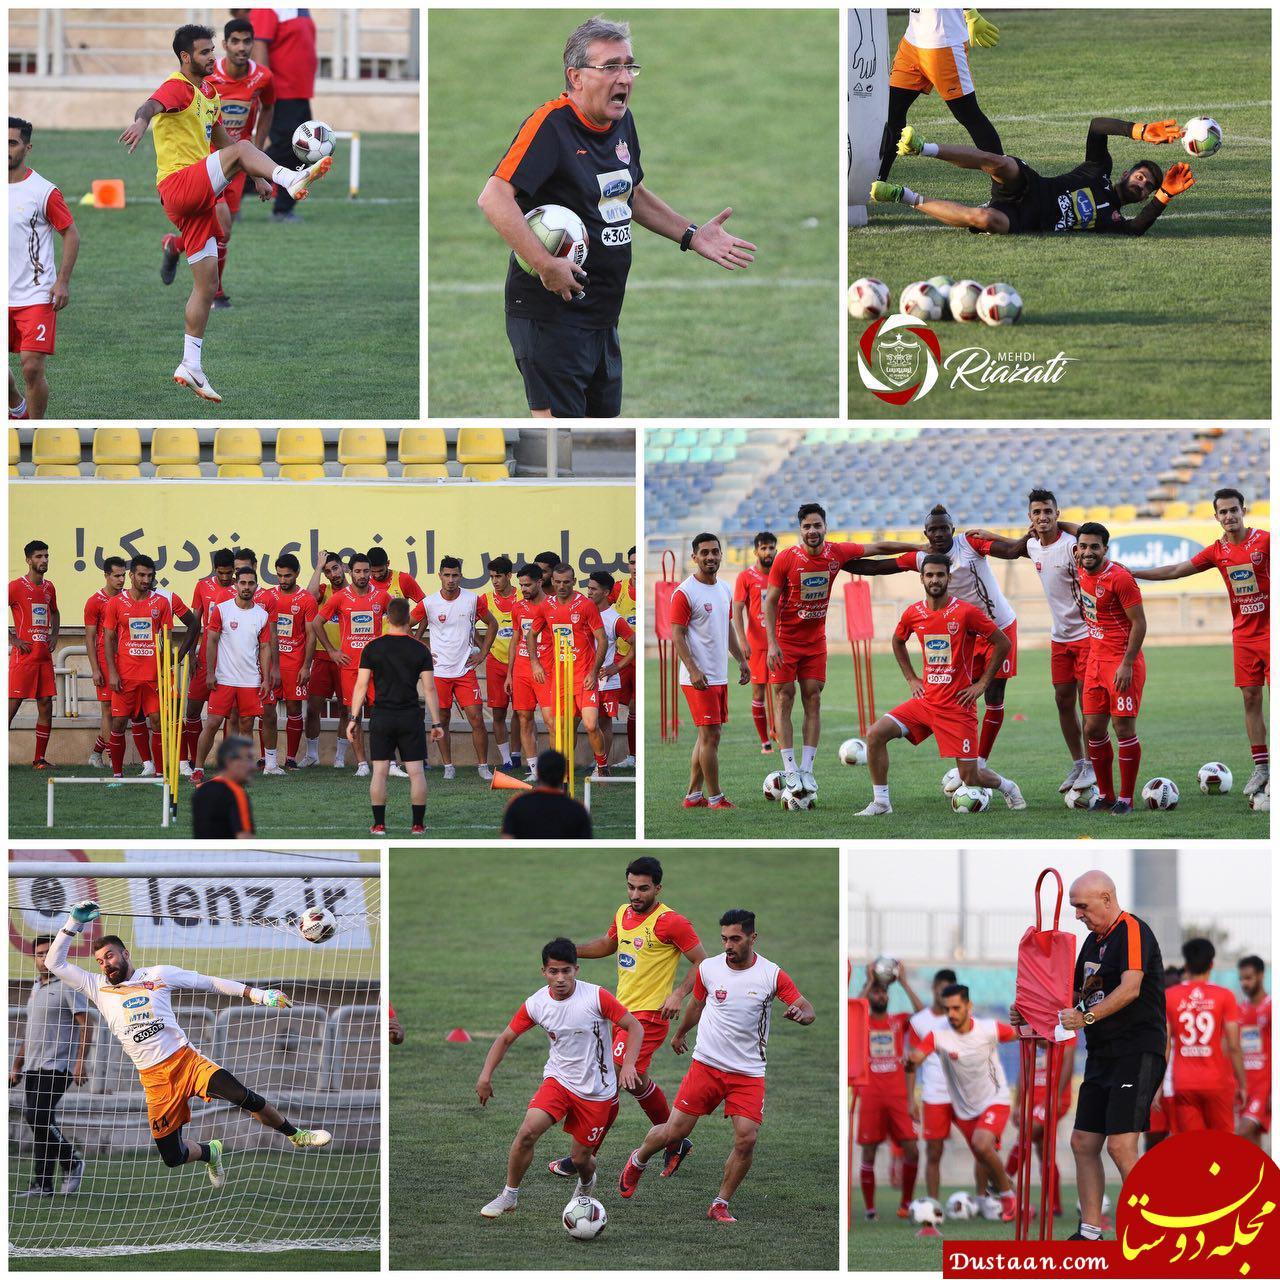 www.dustaan.com تغییر بازی پرسپولیس و الدحیل به دلیل همزمانی با تاسوعا